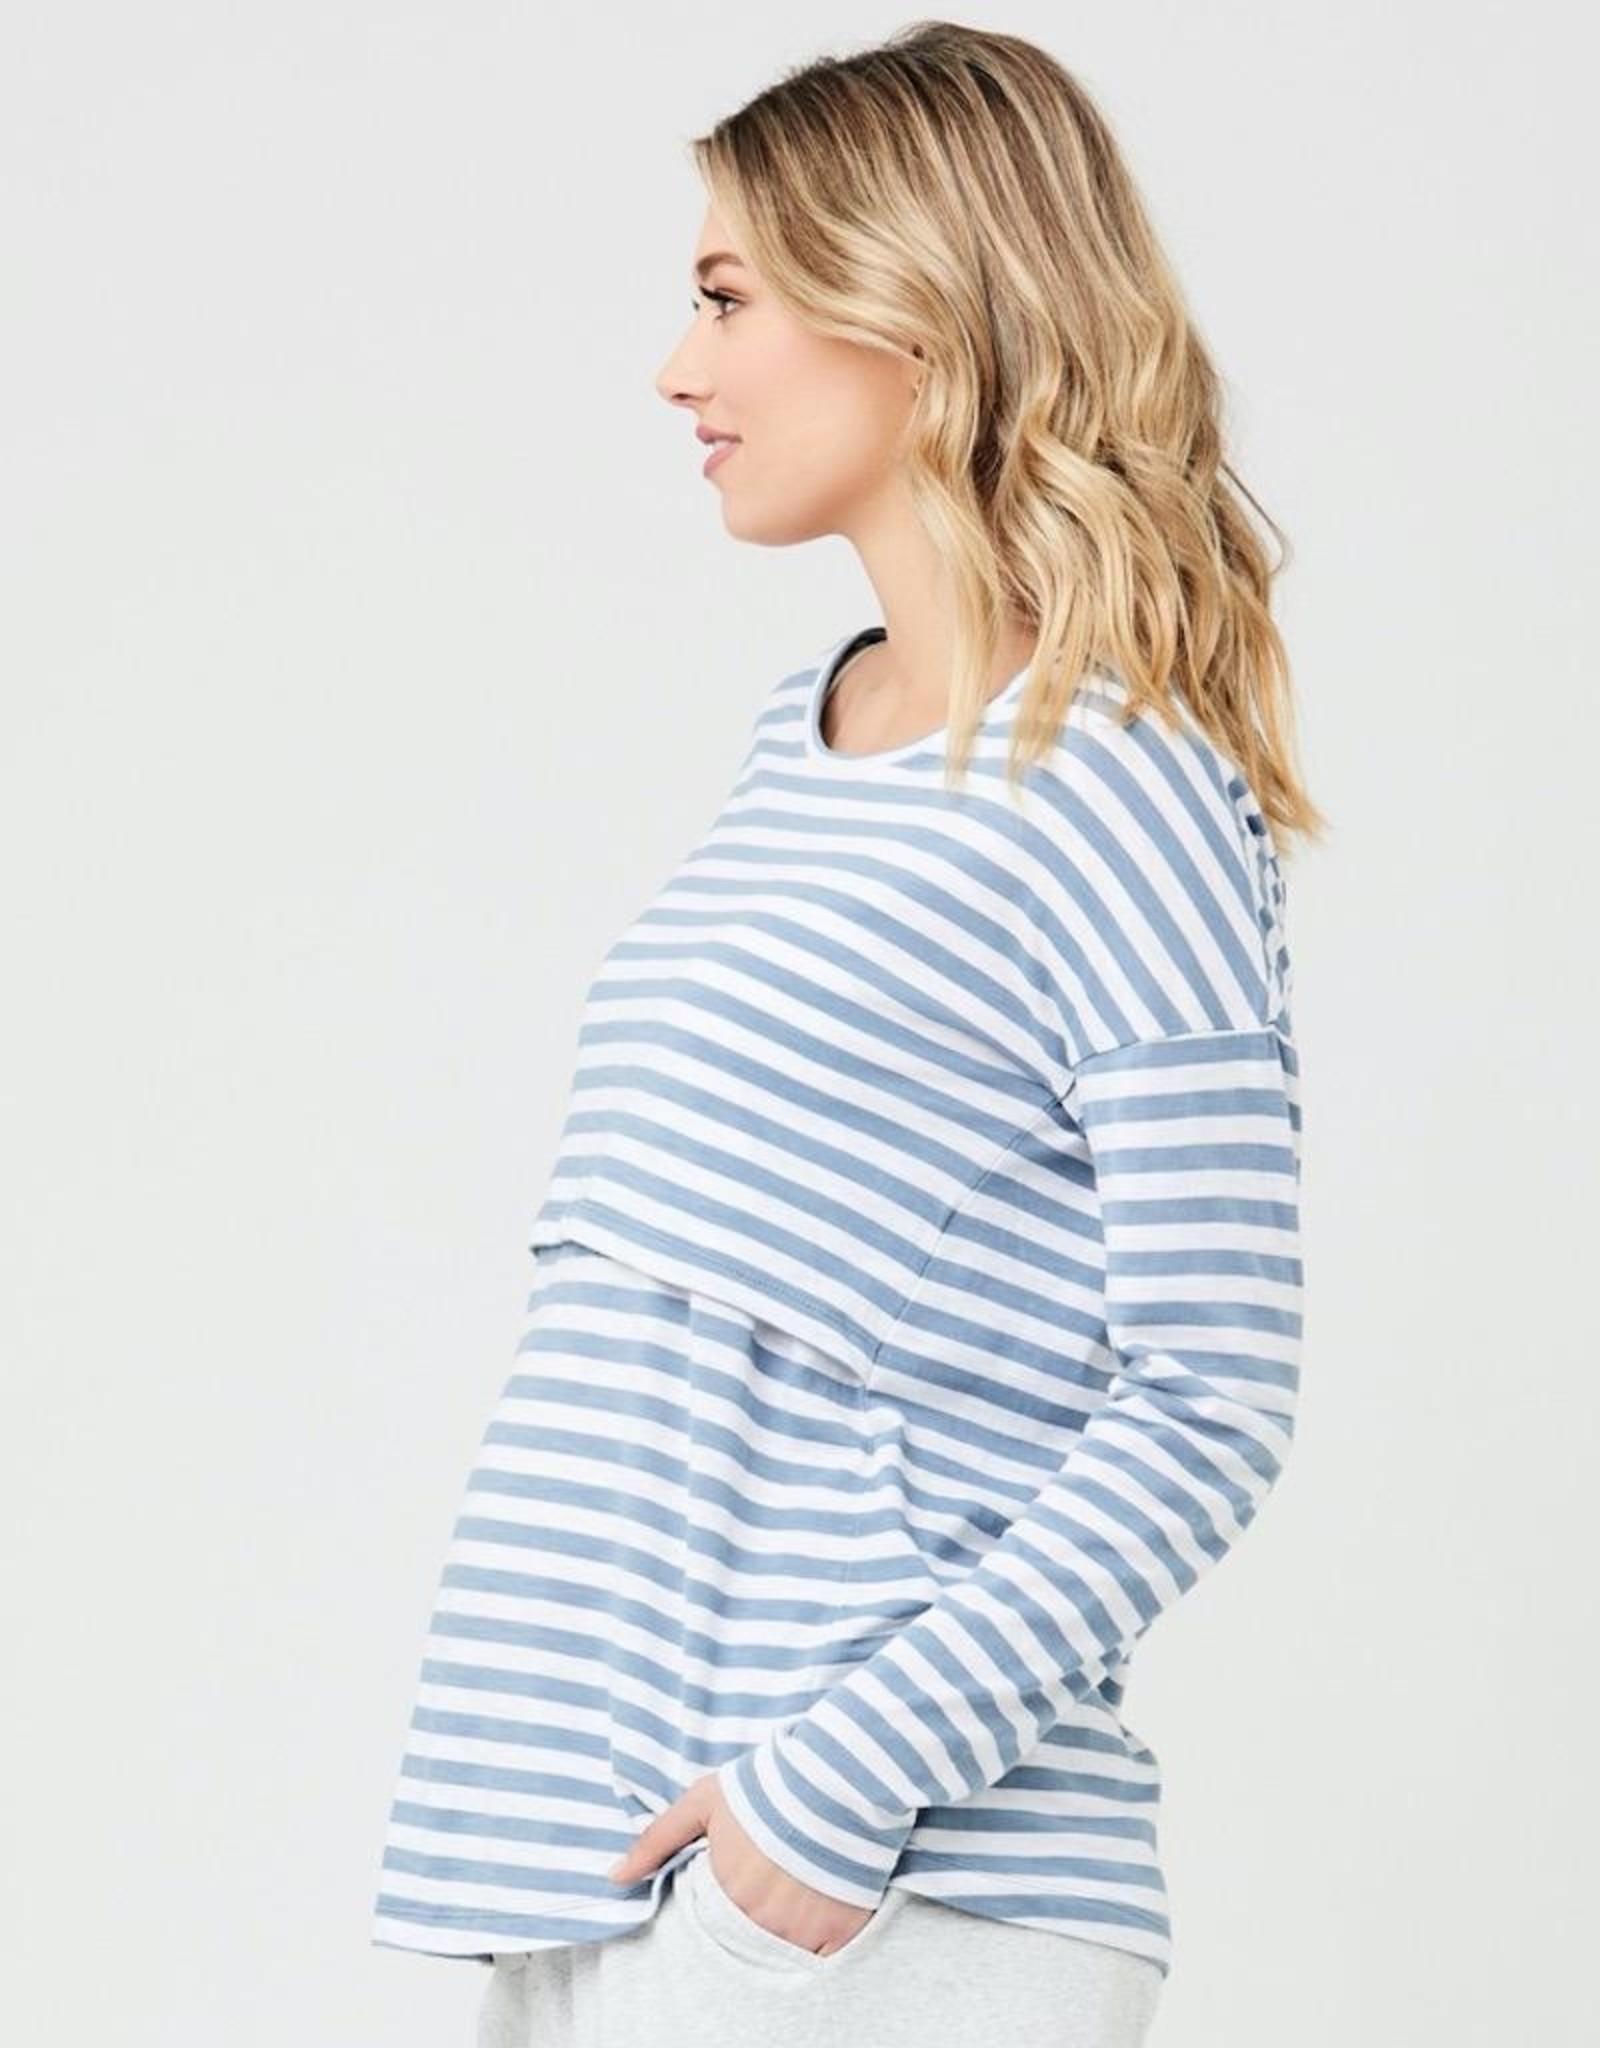 Ripe Maternity Lionel Long Sleeve Nursing Tee in Petrol / White